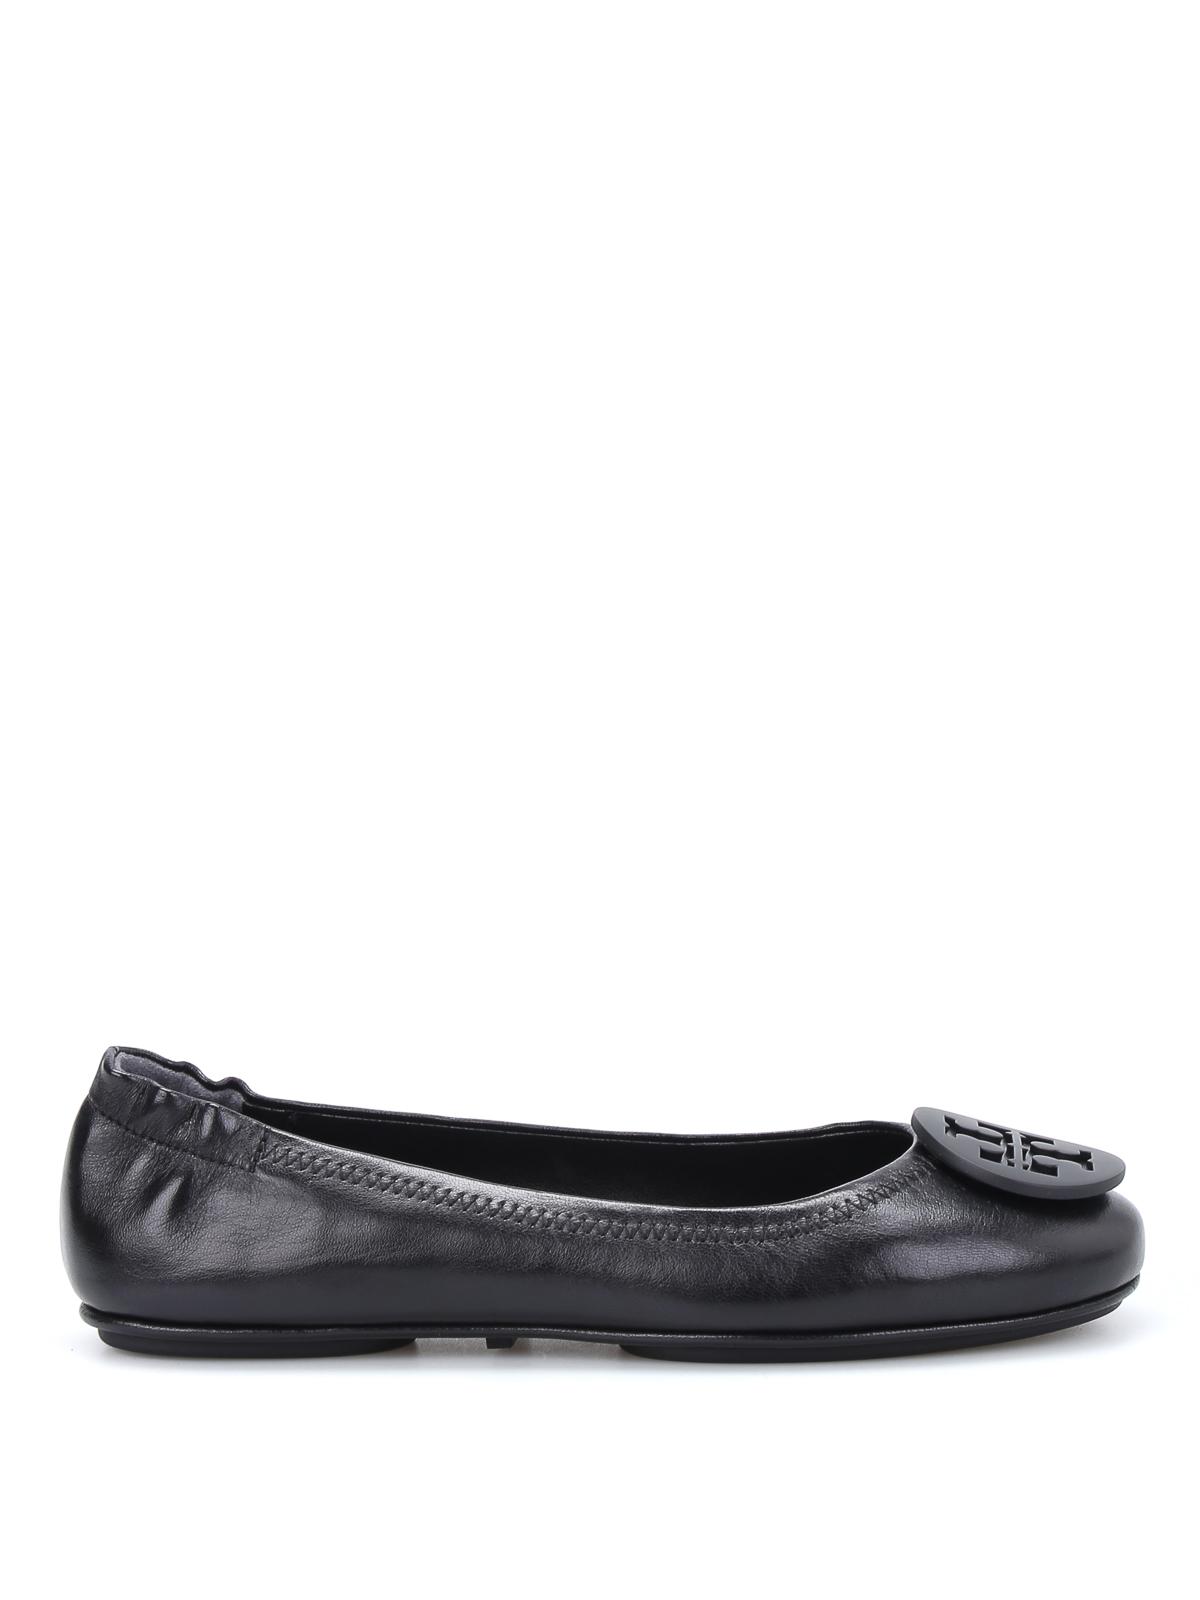 Tory Burch: flat shoes - Minnie logo leather ballerinas